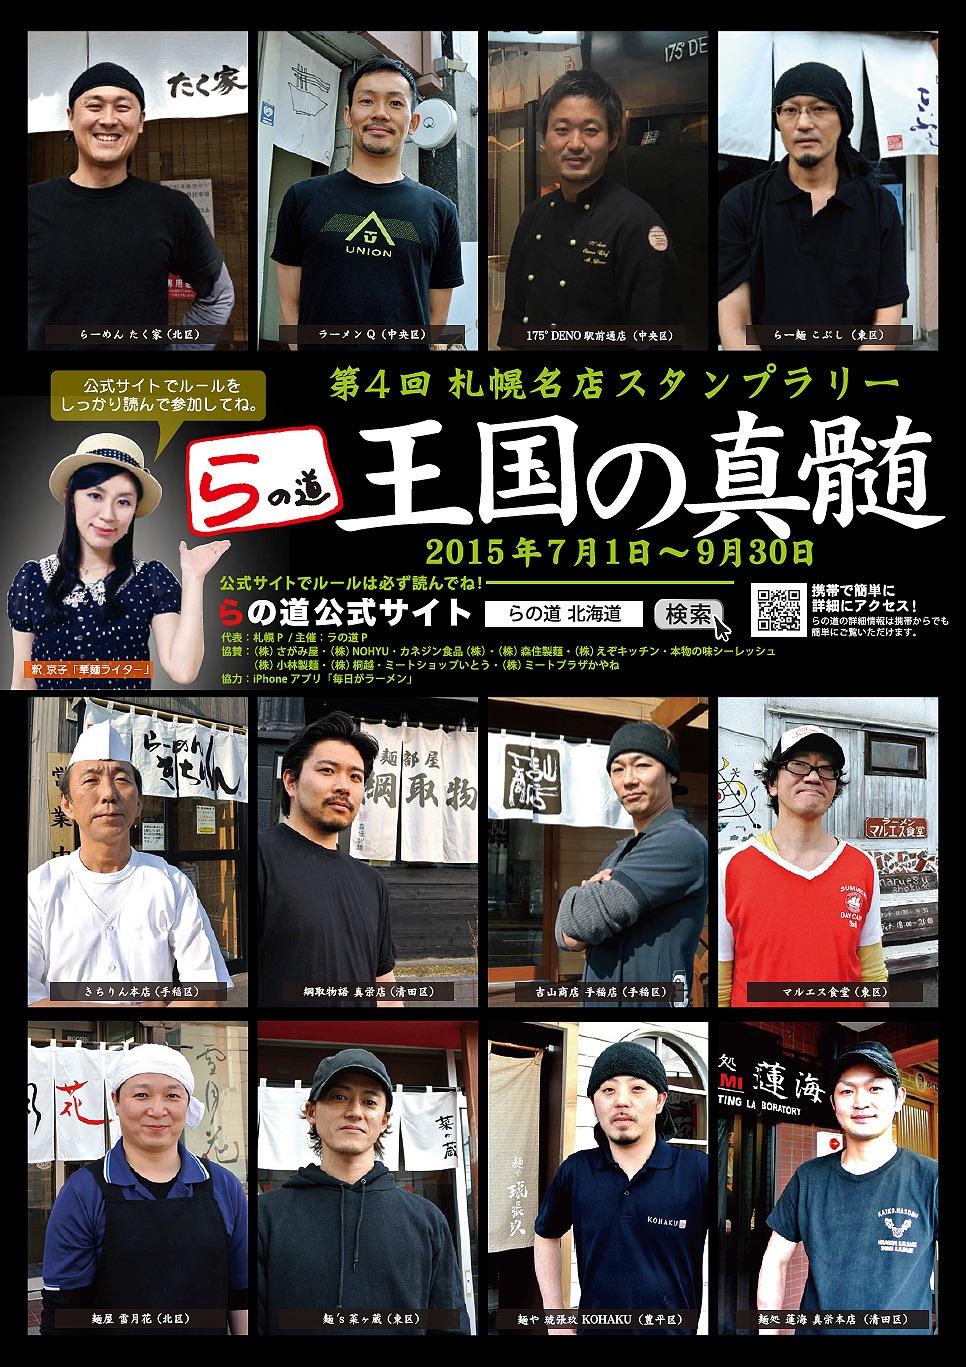 http://www.recruit-hokkaido-jalan.jp/news_sapporo/%E3%83%81%E3%83%A9%E3%82%B7.jpg